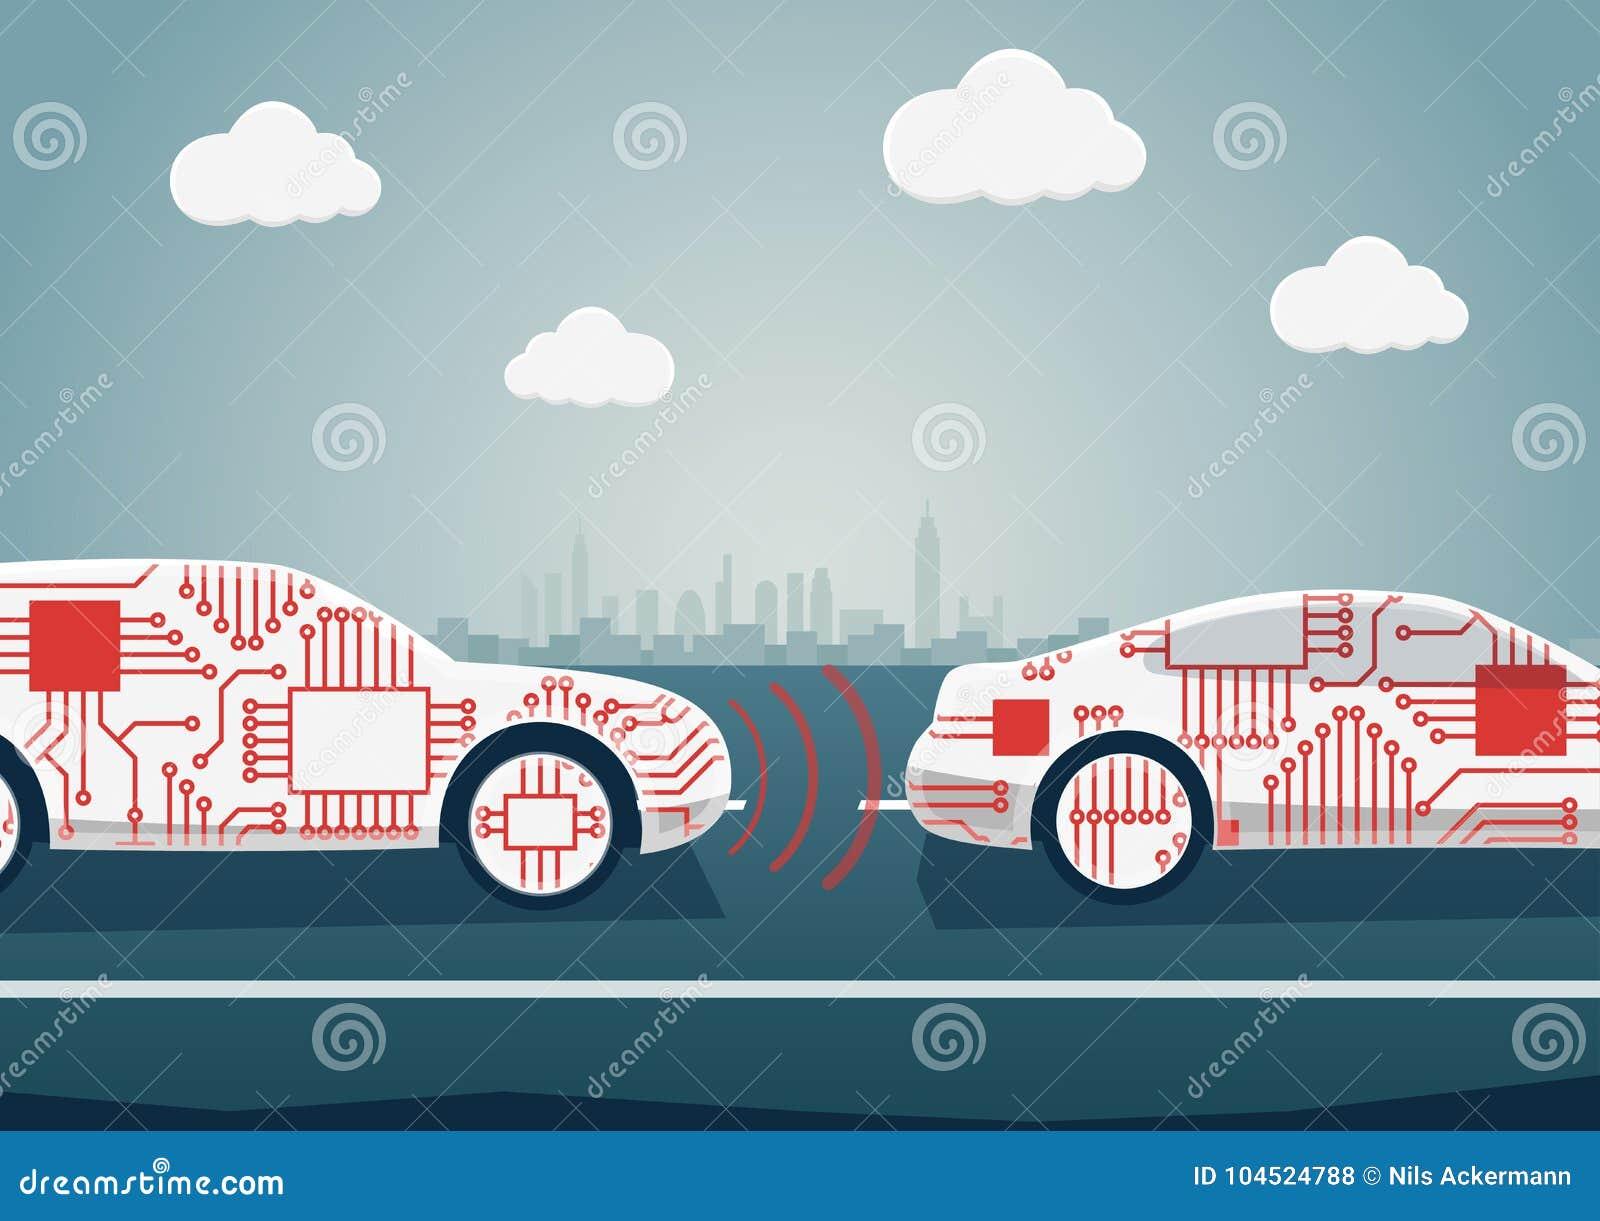 Autonomous Driving Concept As Example For Digitalisation Of